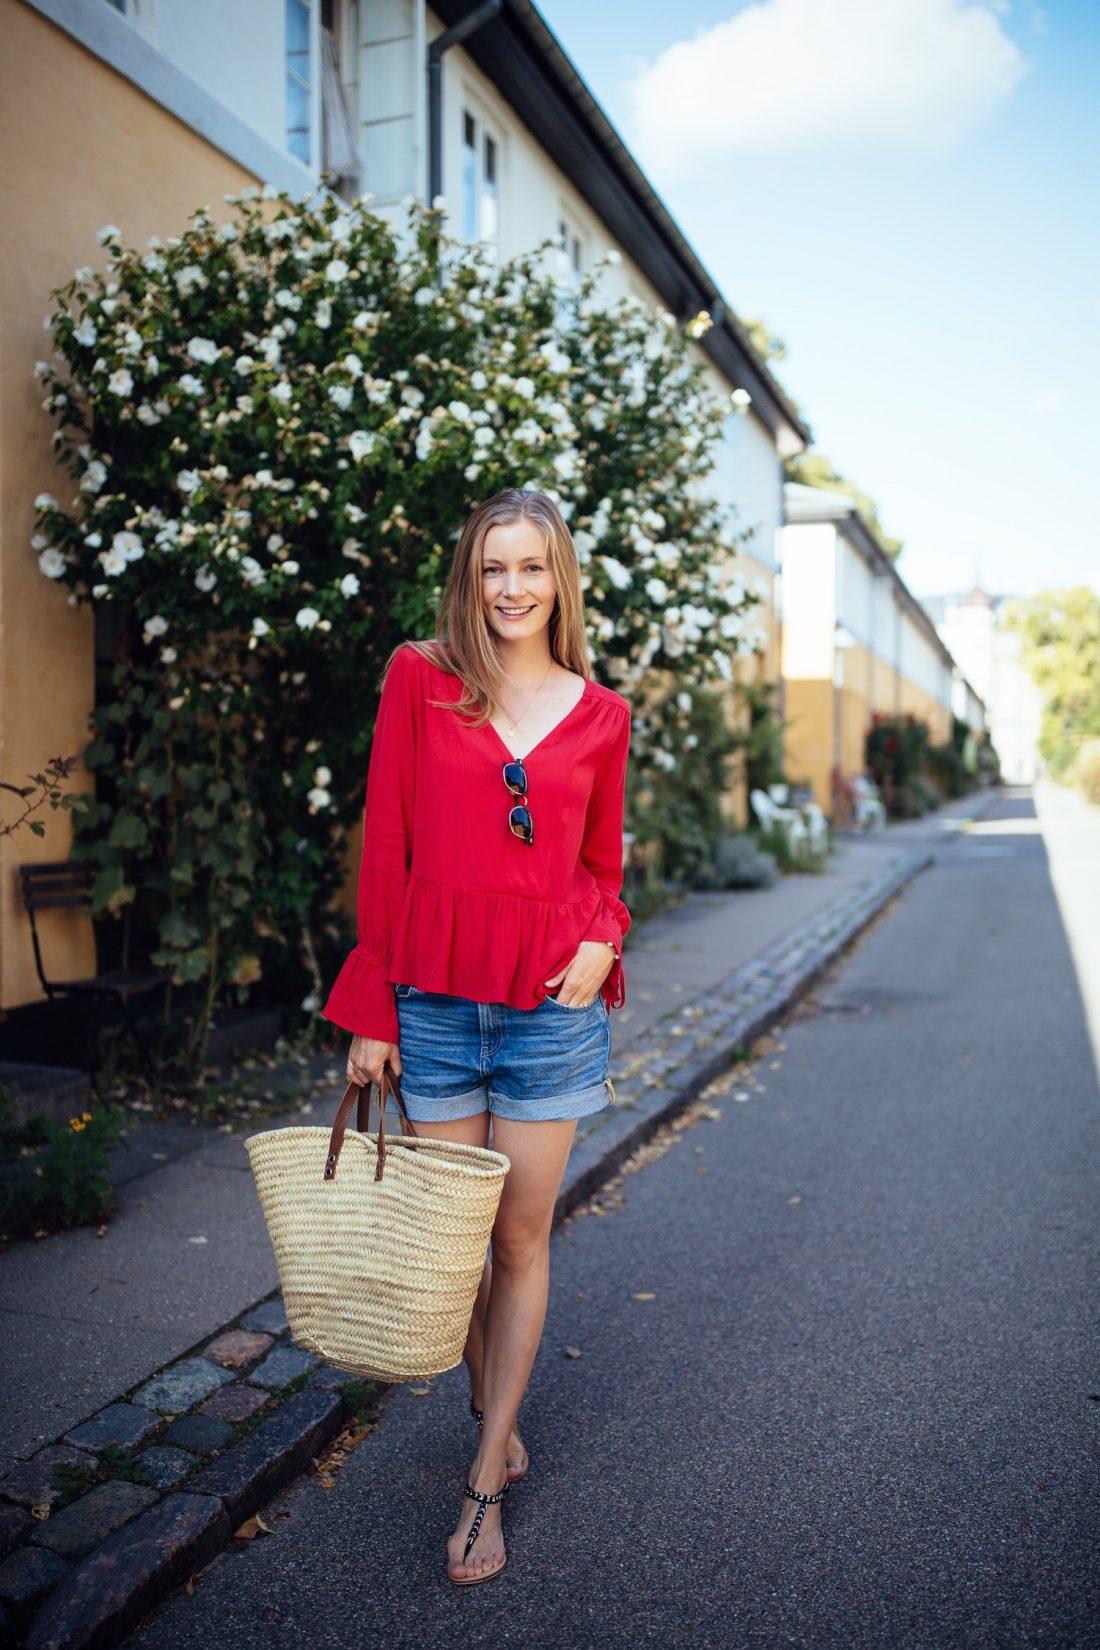 Stockholm dating site